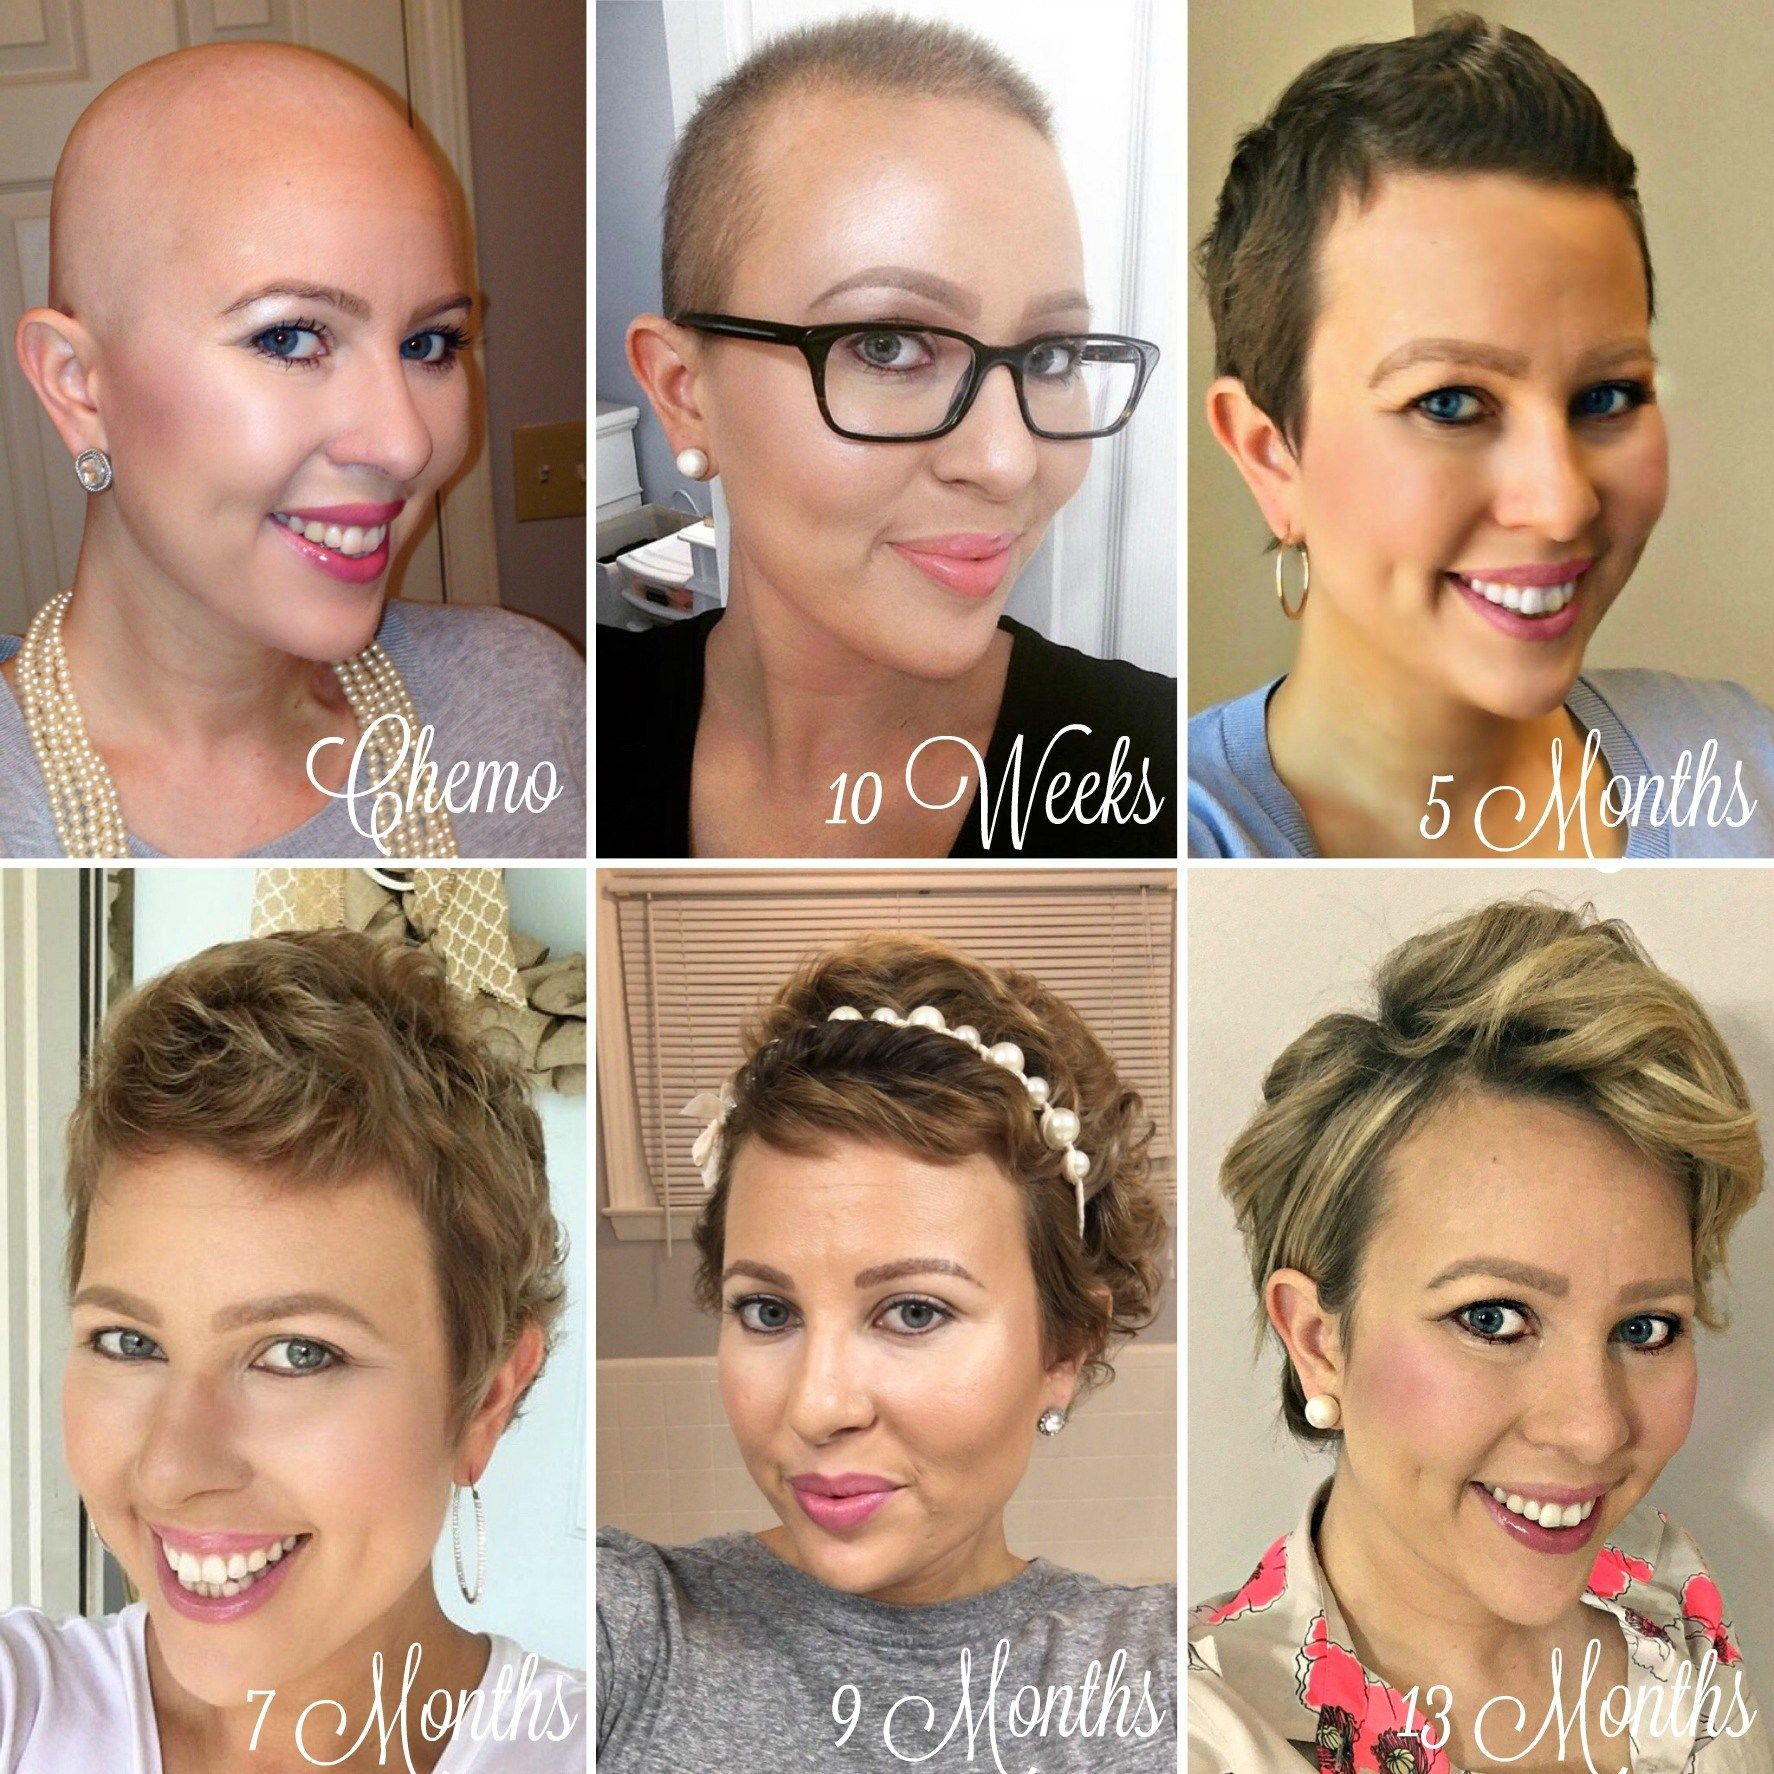 3 Year Hair Growth: Chemo Hairless - My Cancer Chic #HairRegrowth